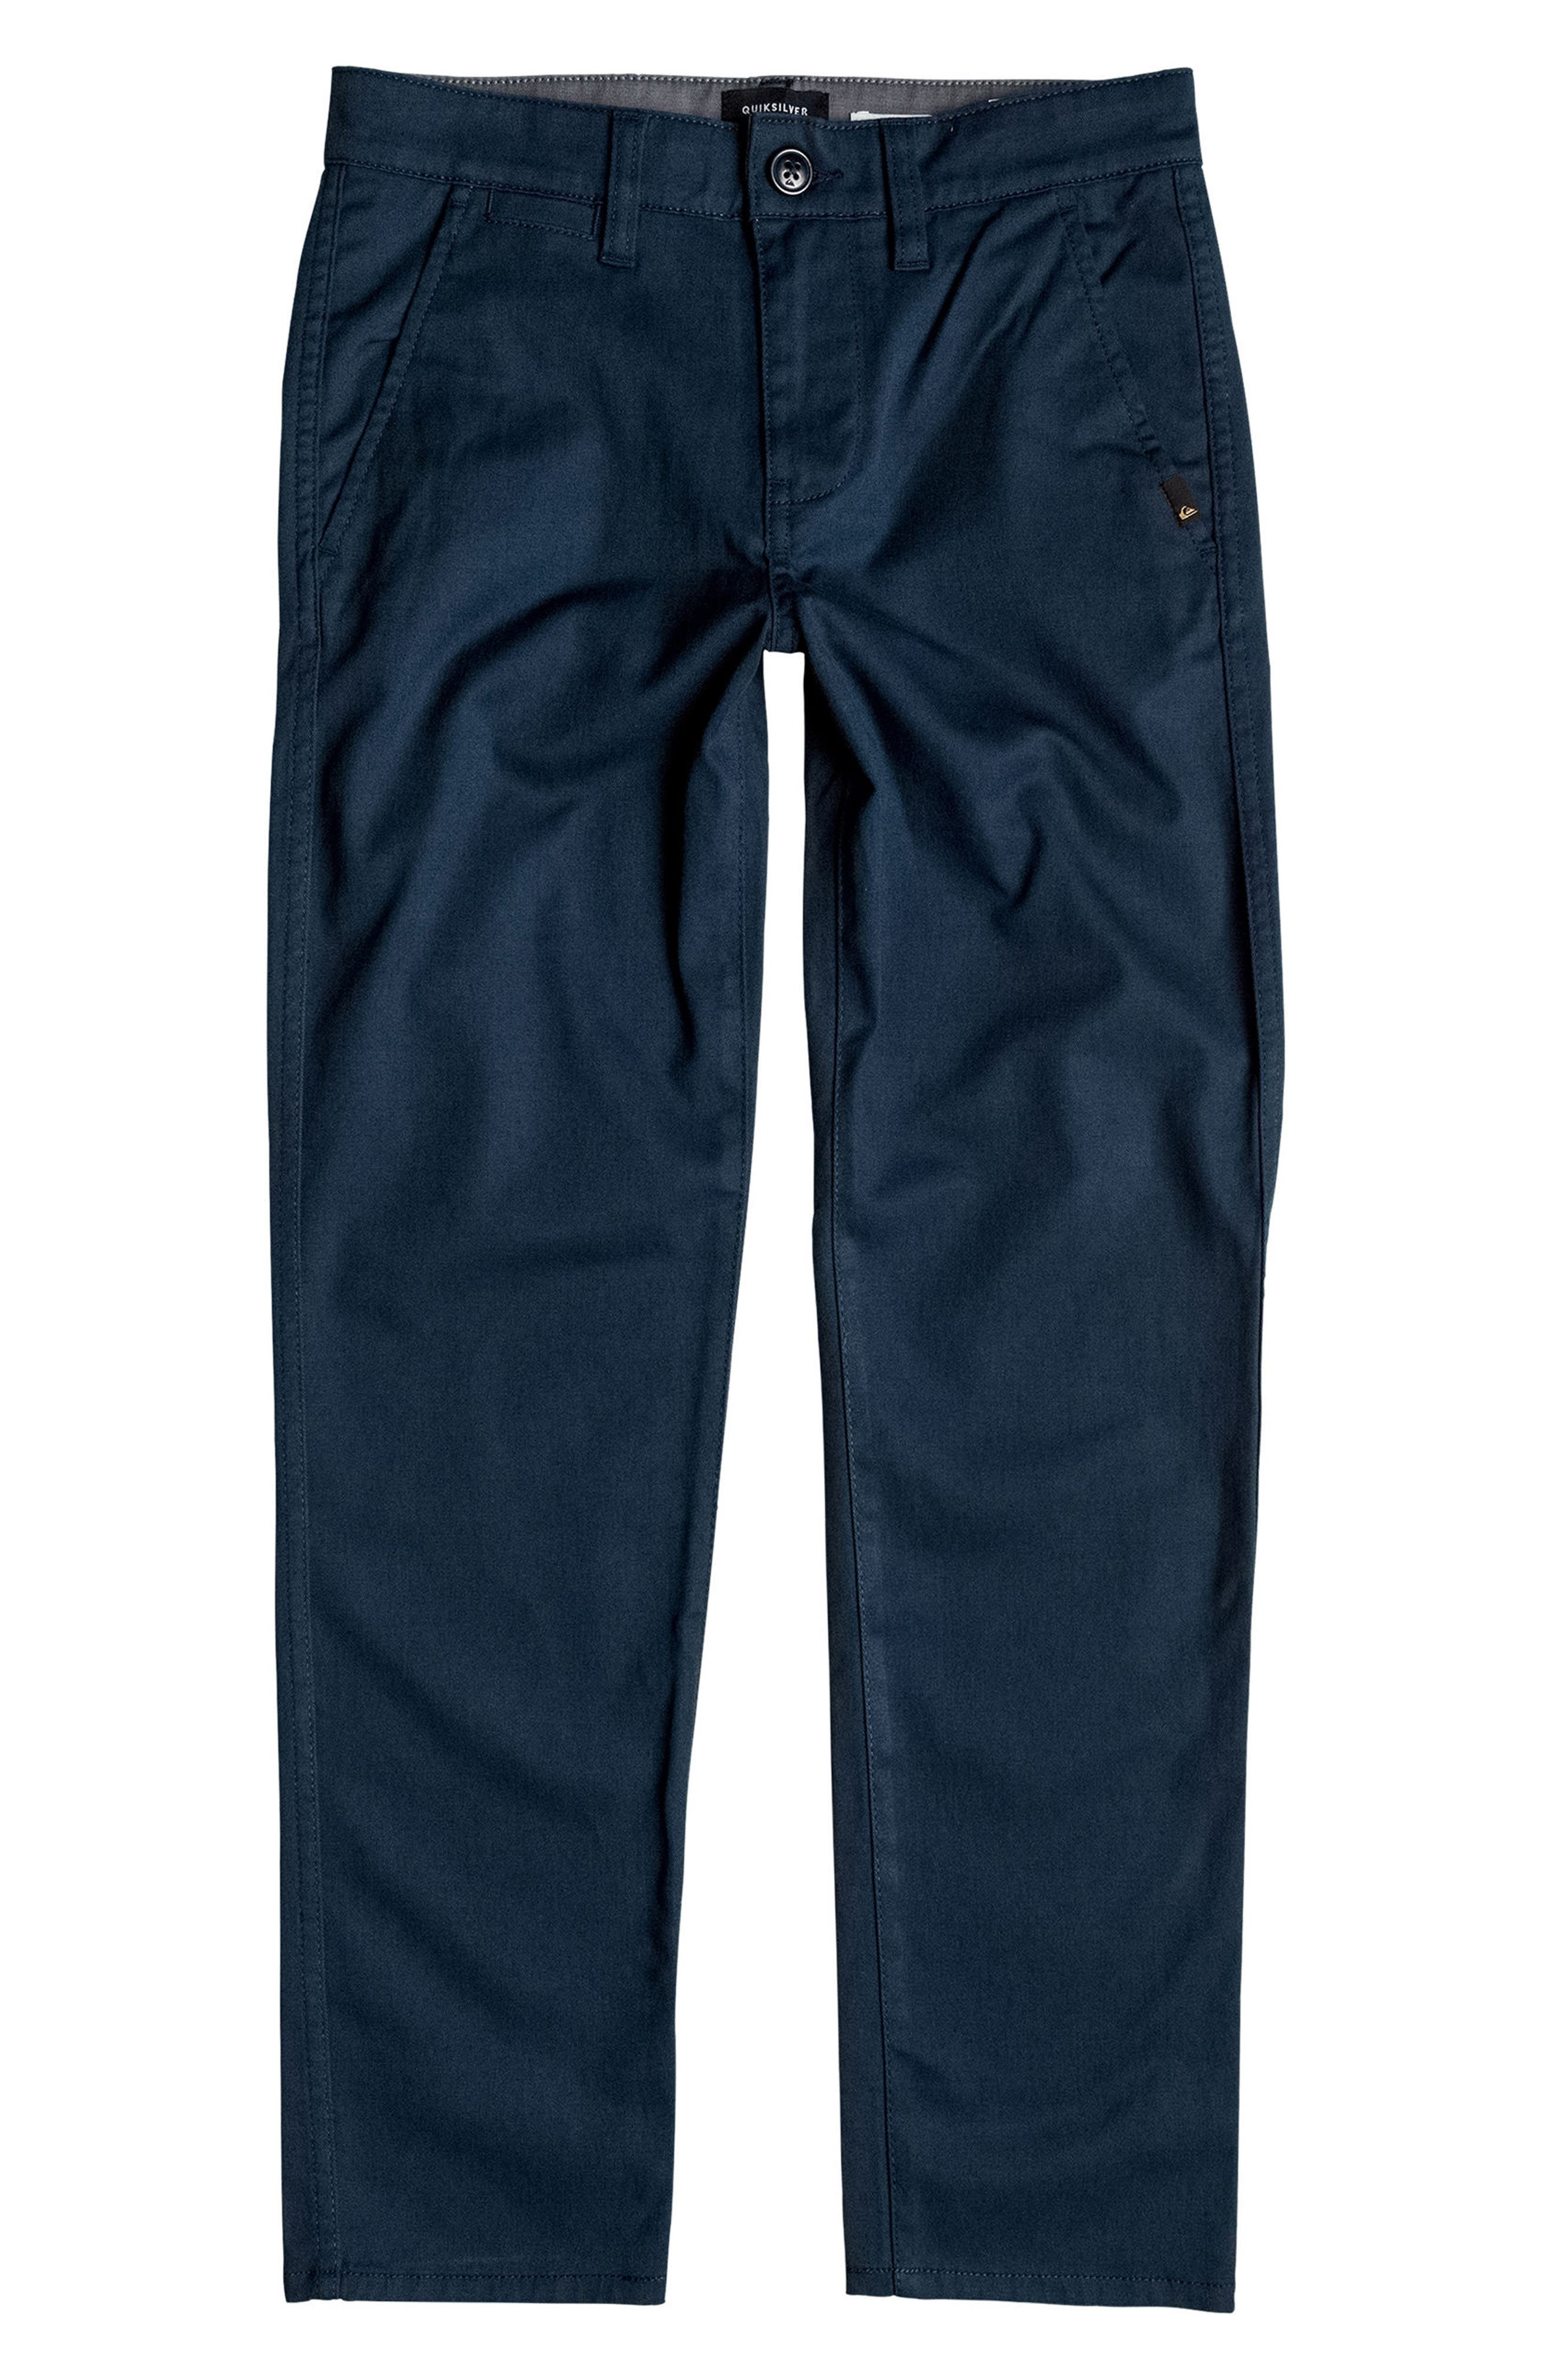 Main Image - Quiksilver Regular Fit Everyday Union Pants (Big Boys)